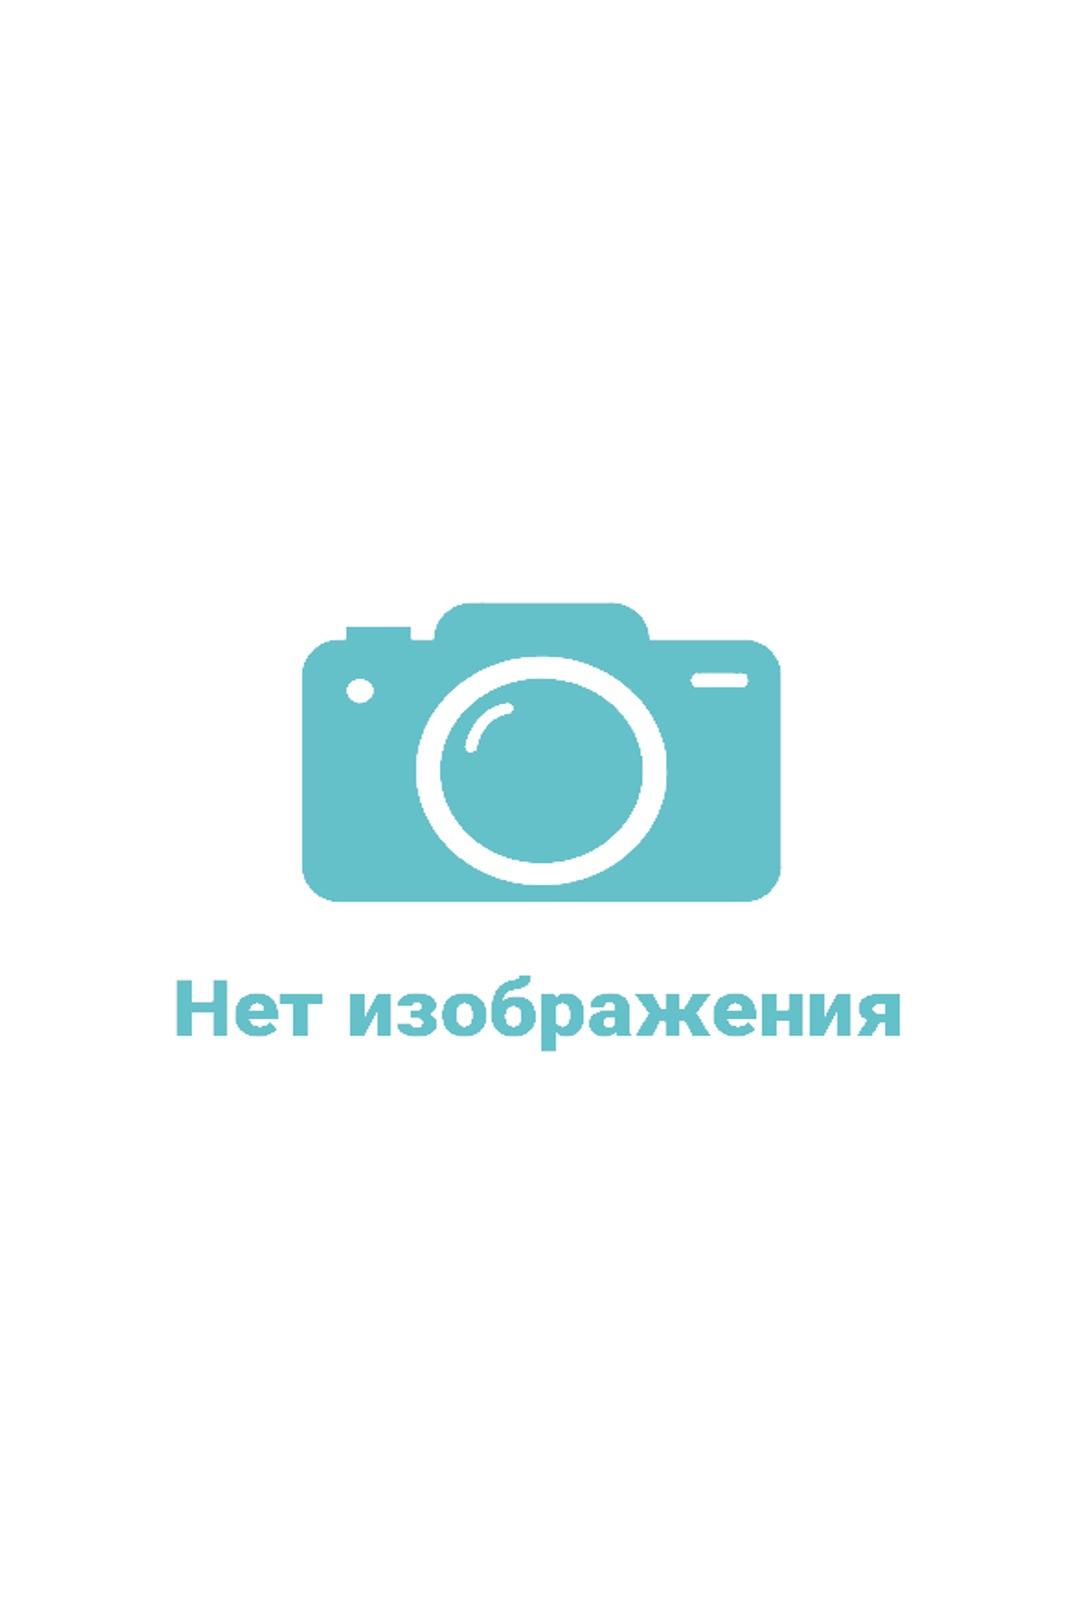 Врач гинеколог Зюлковский Андрей Чеславович